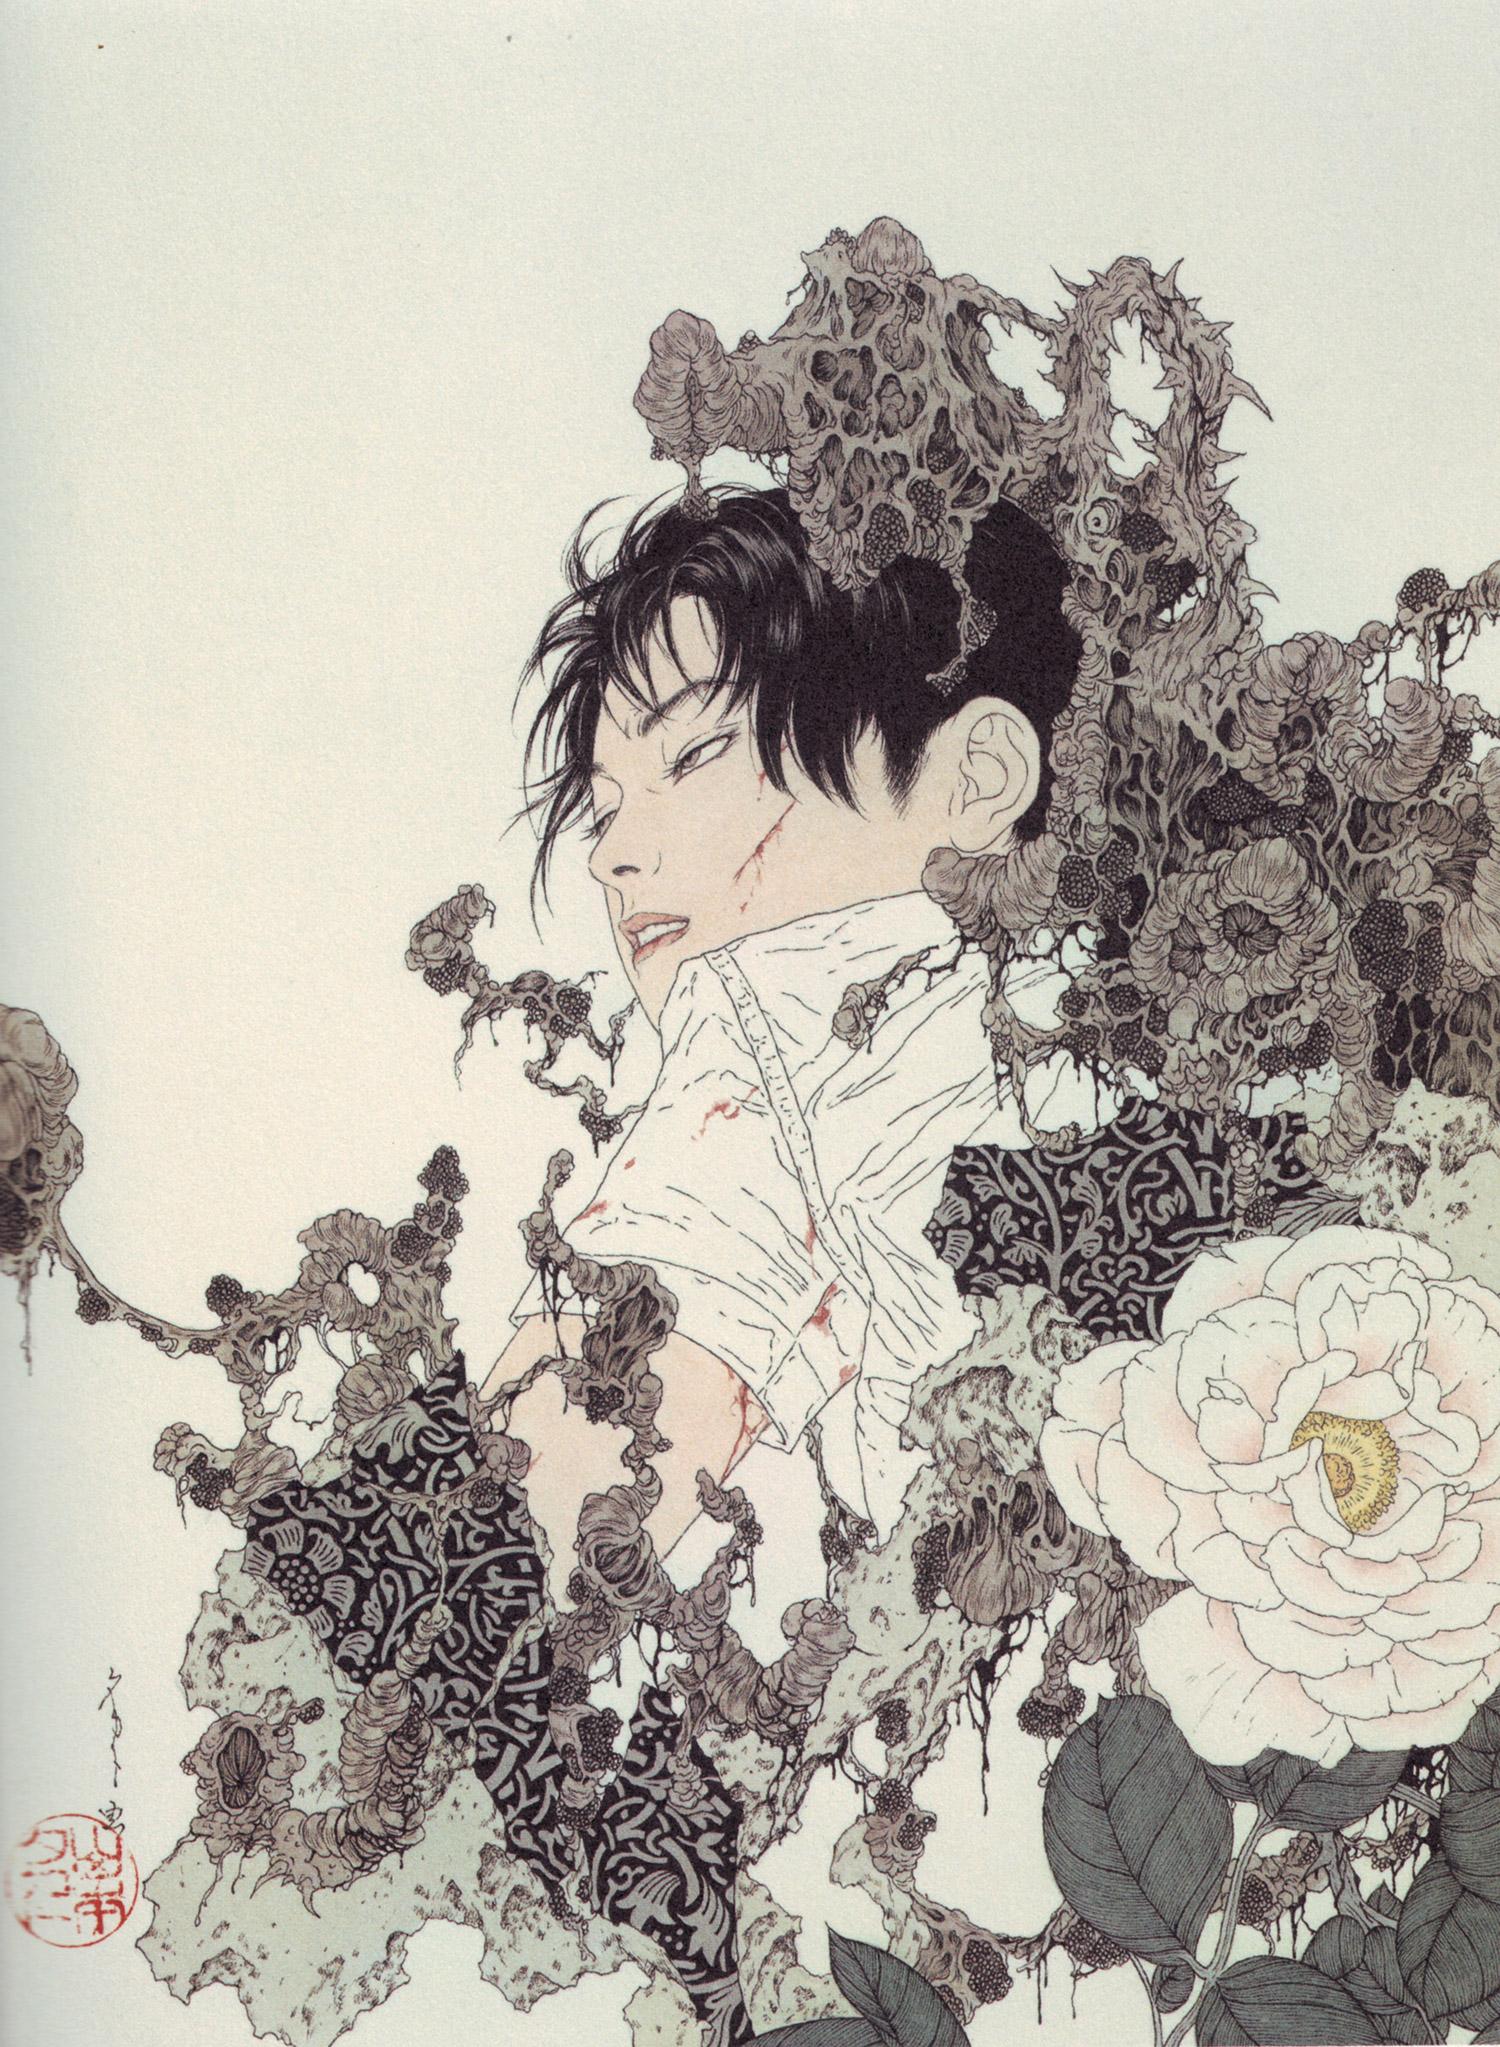 Takato Yamamoto - man